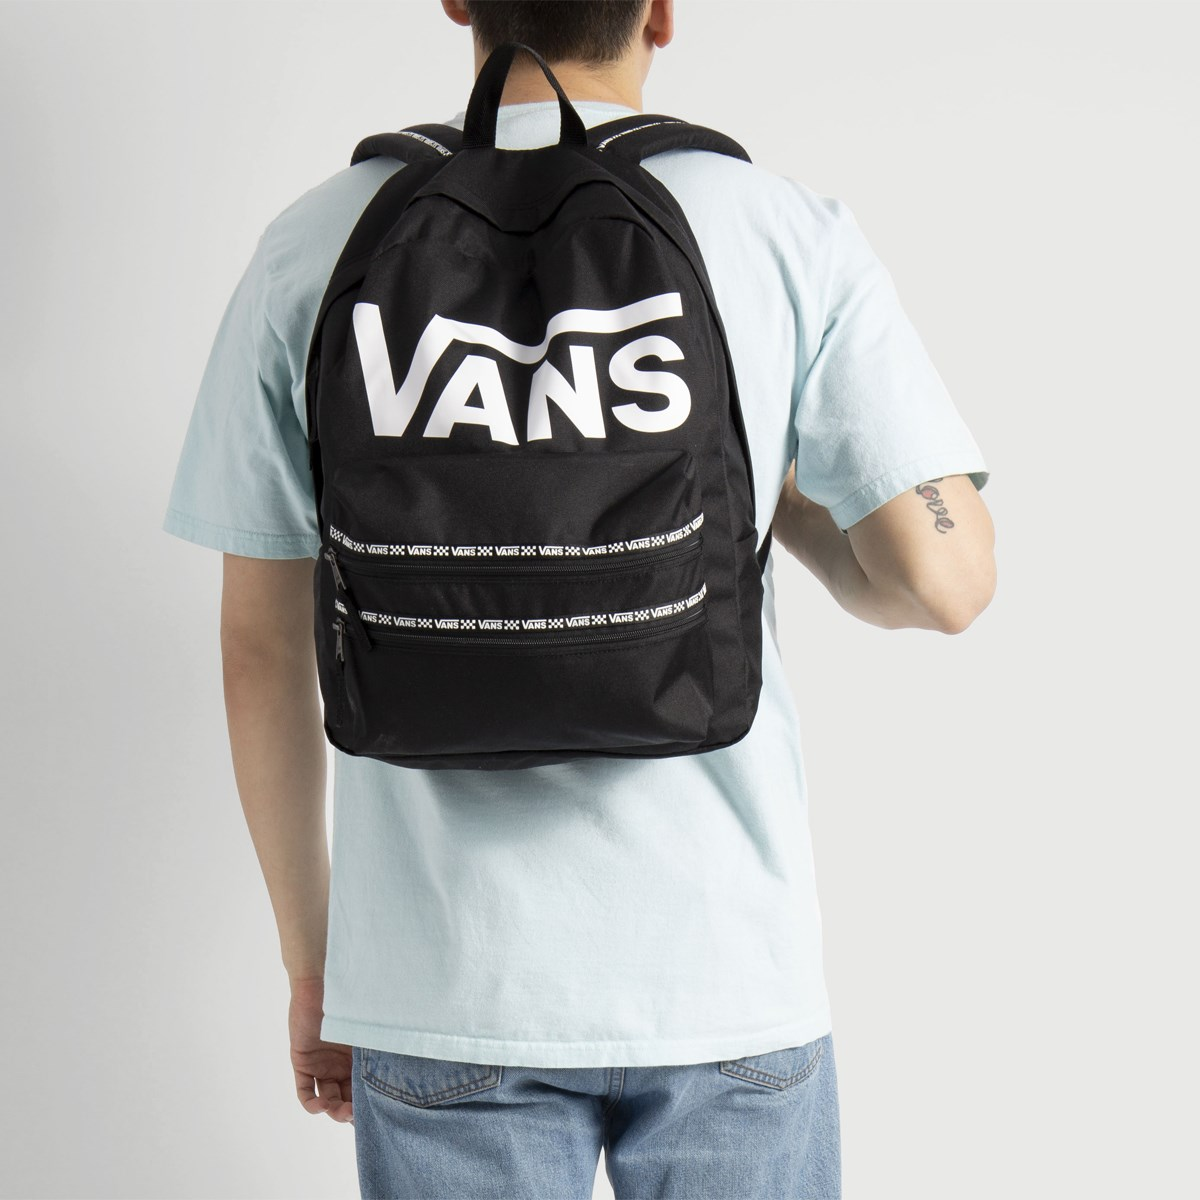 a7aa2f850f8 Buy vans marvel backpack   OFF43% Discounts